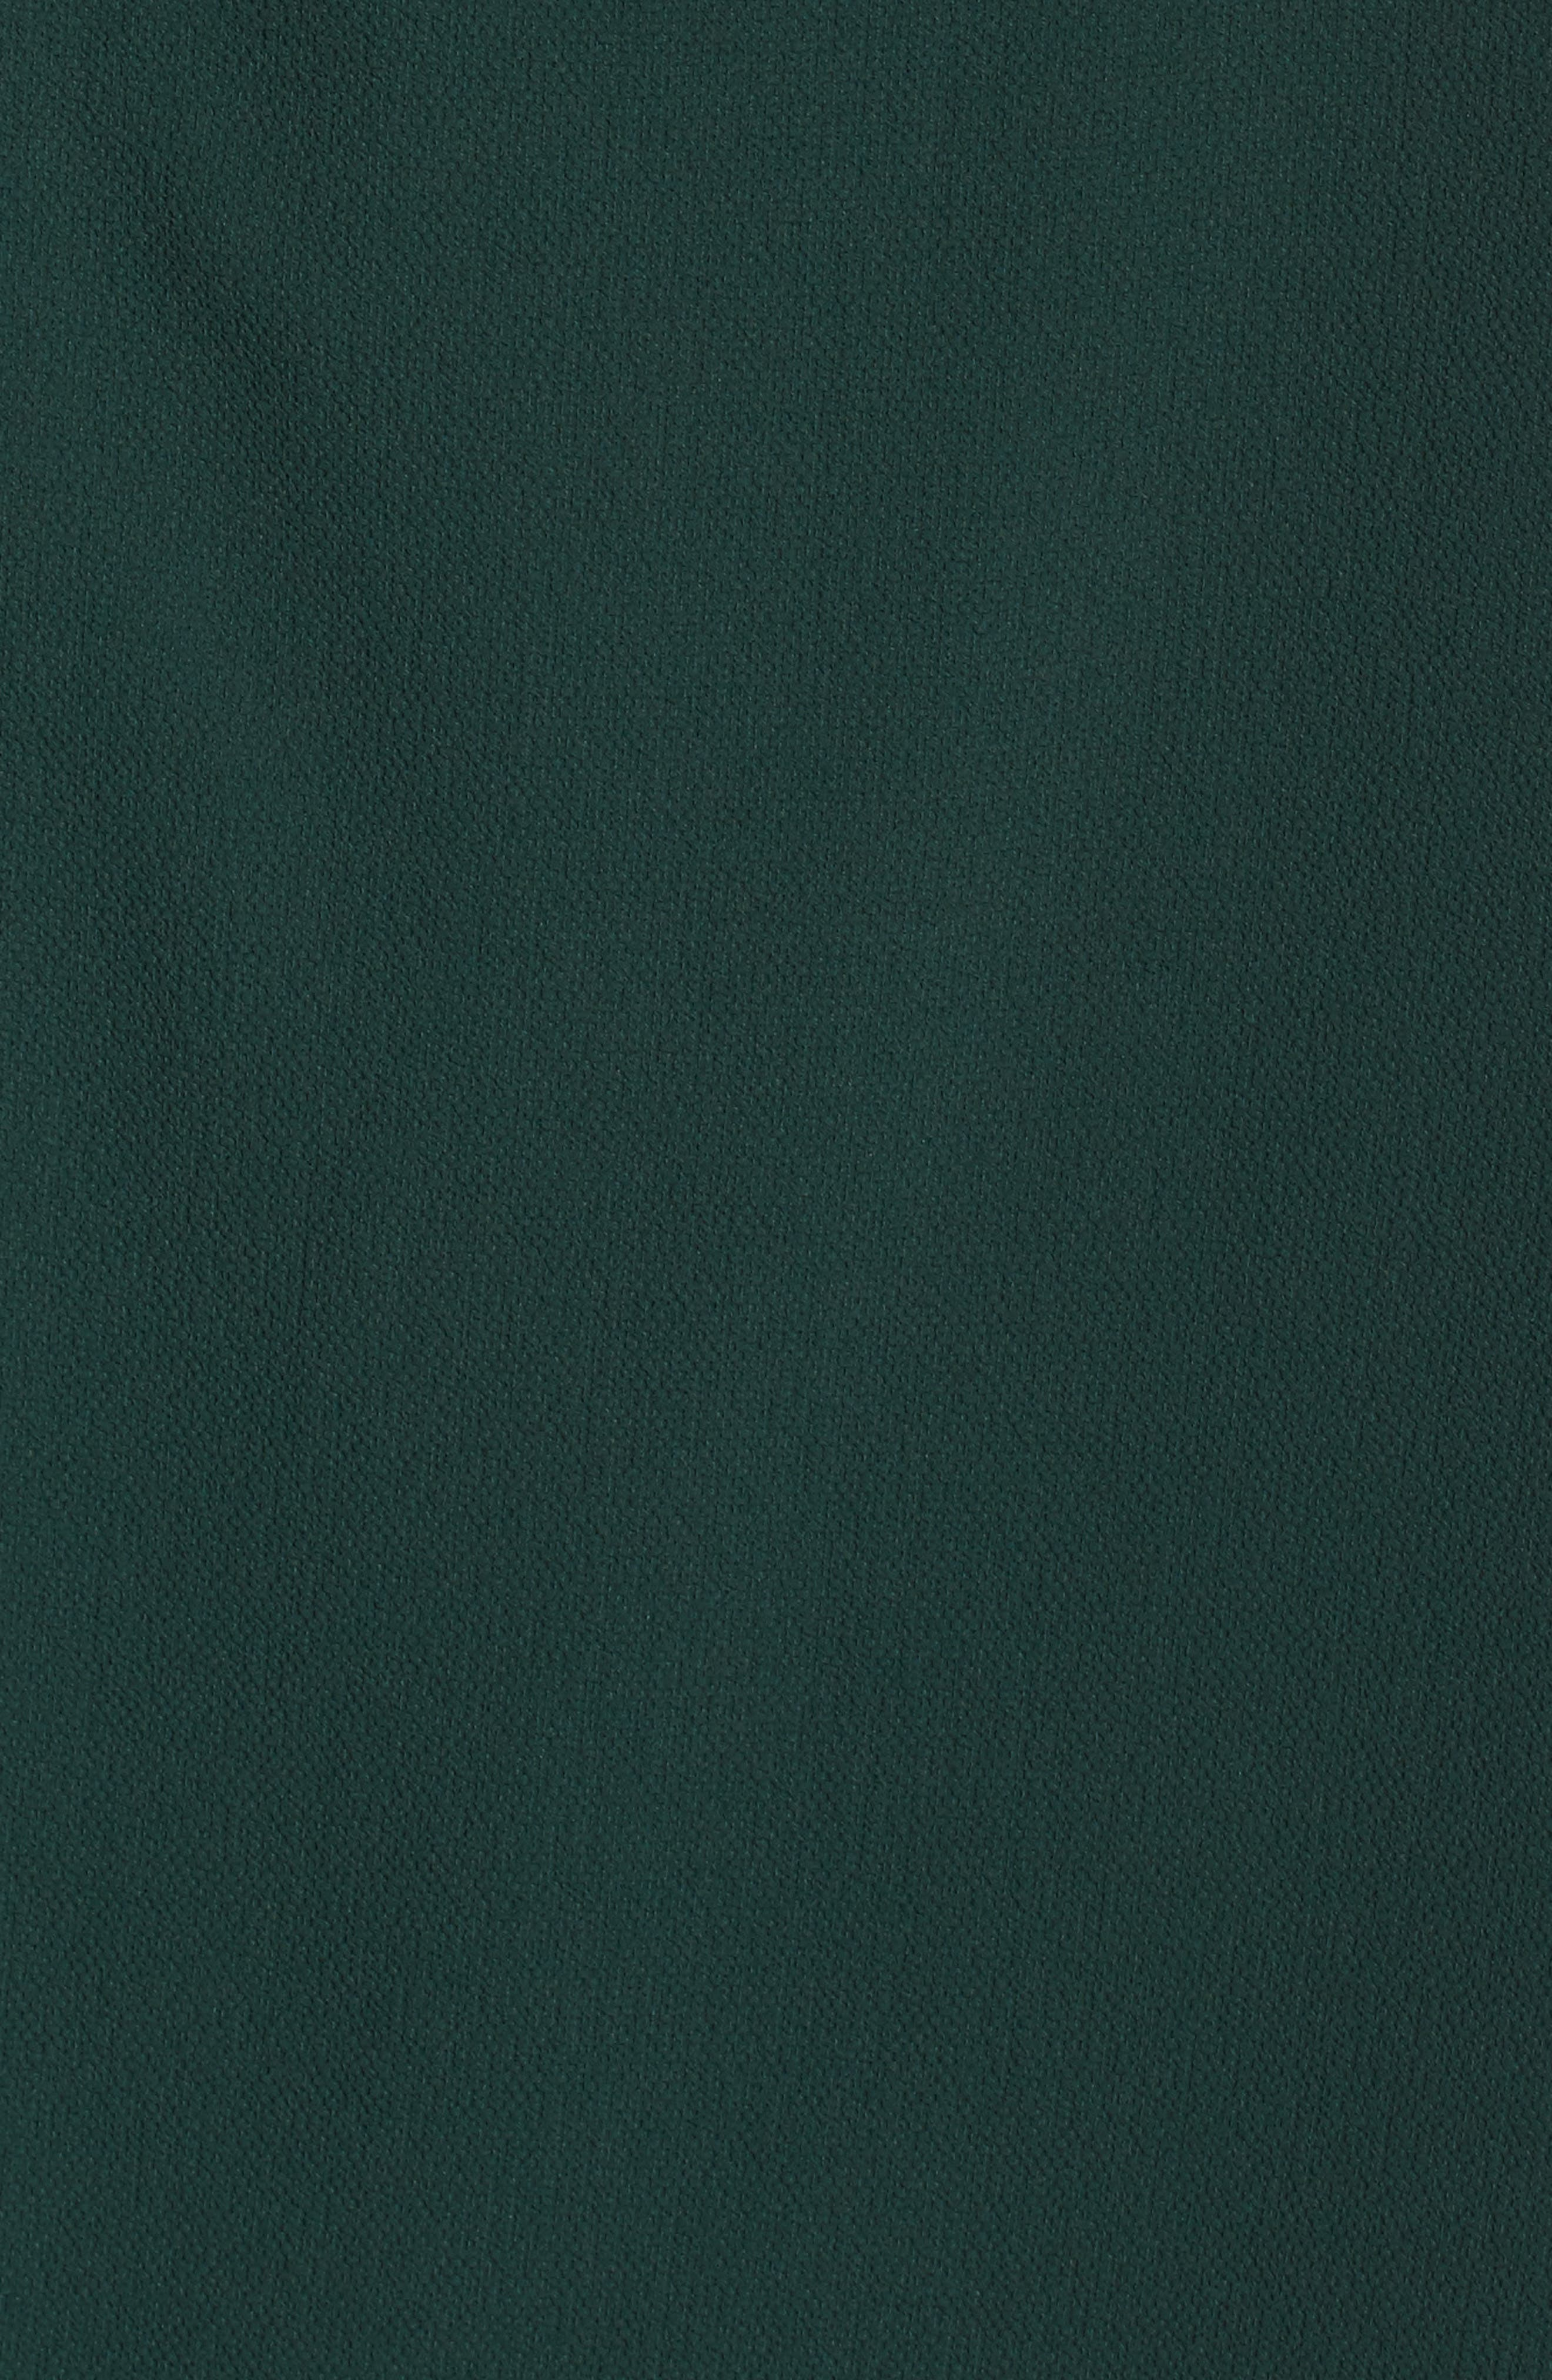 Off the Shoulder Ruffle Dress,                             Alternate thumbnail 5, color,                             301